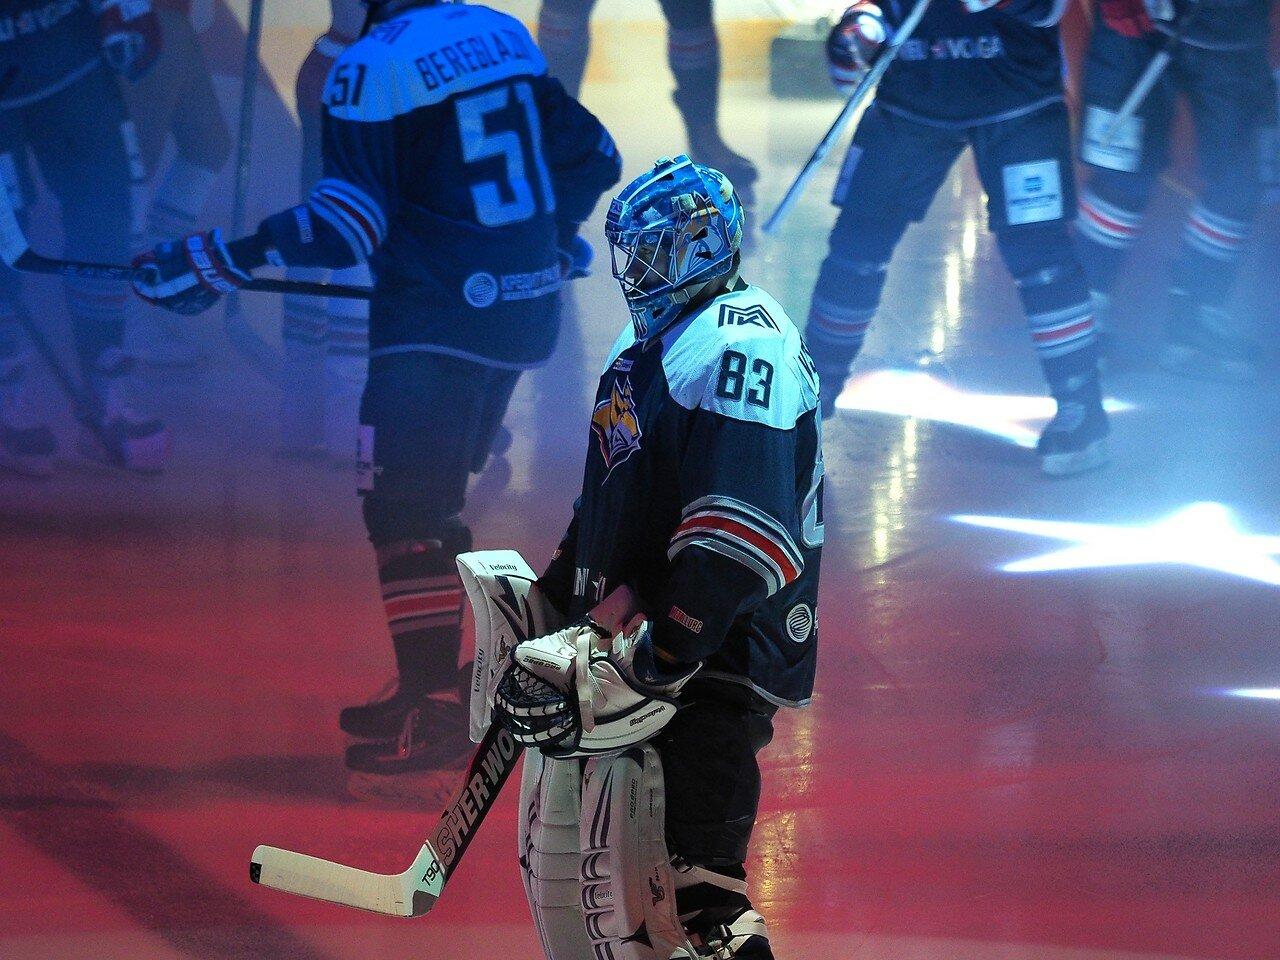 51Восток 1/2 плей-офф Металлург - Сибирь 08.03.2016